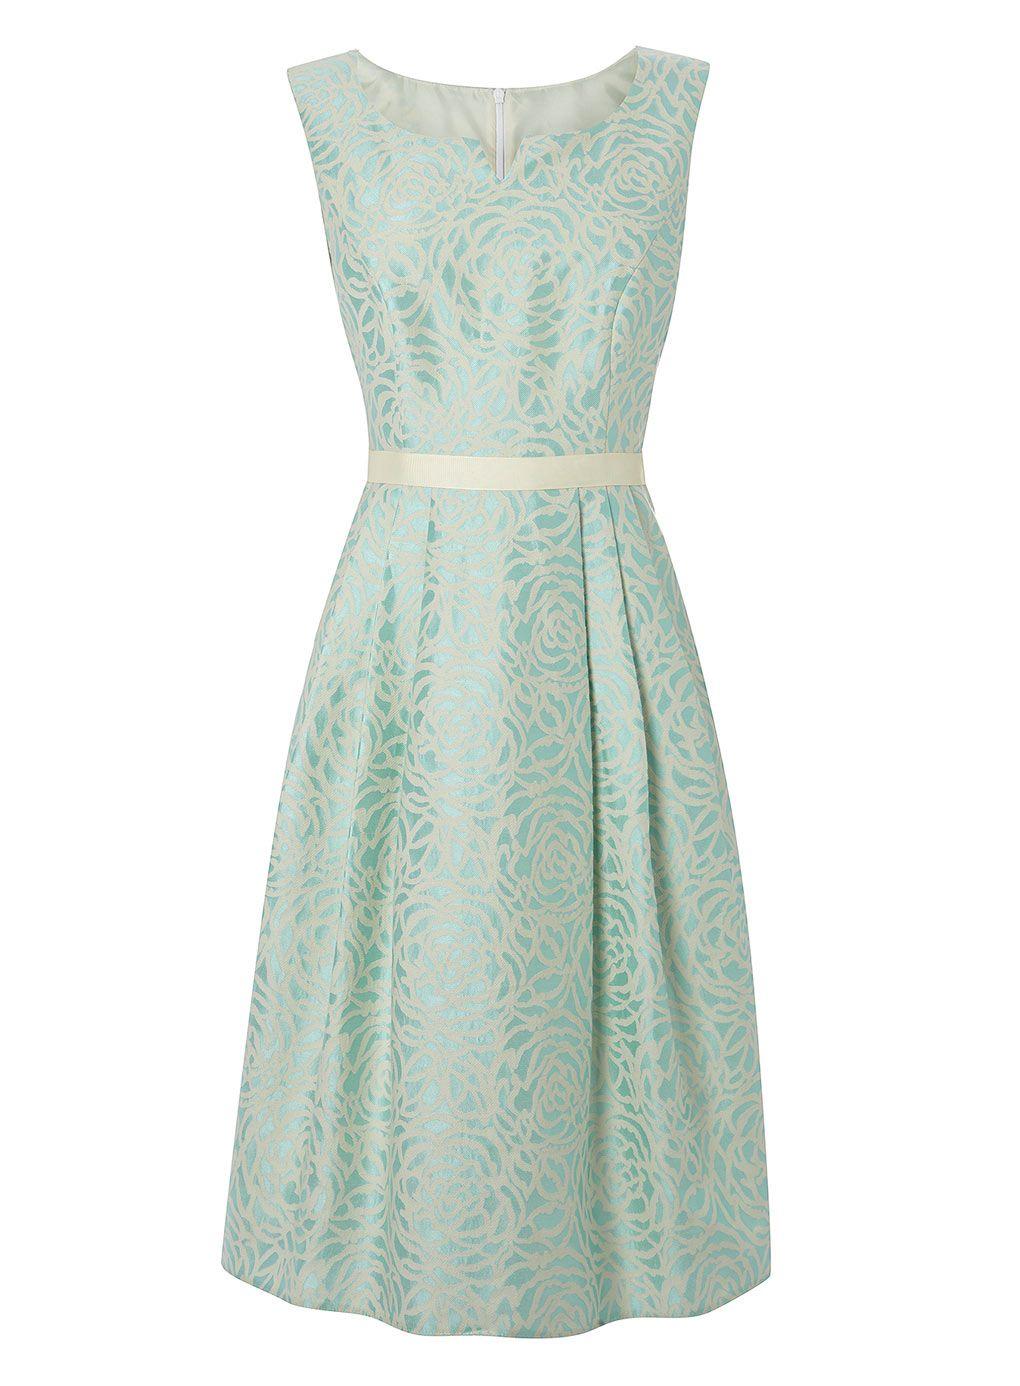 Mint textured prom dress httpweddingheartbhs mother mint textured prom dress httpweddingheart ombrellifo Choice Image